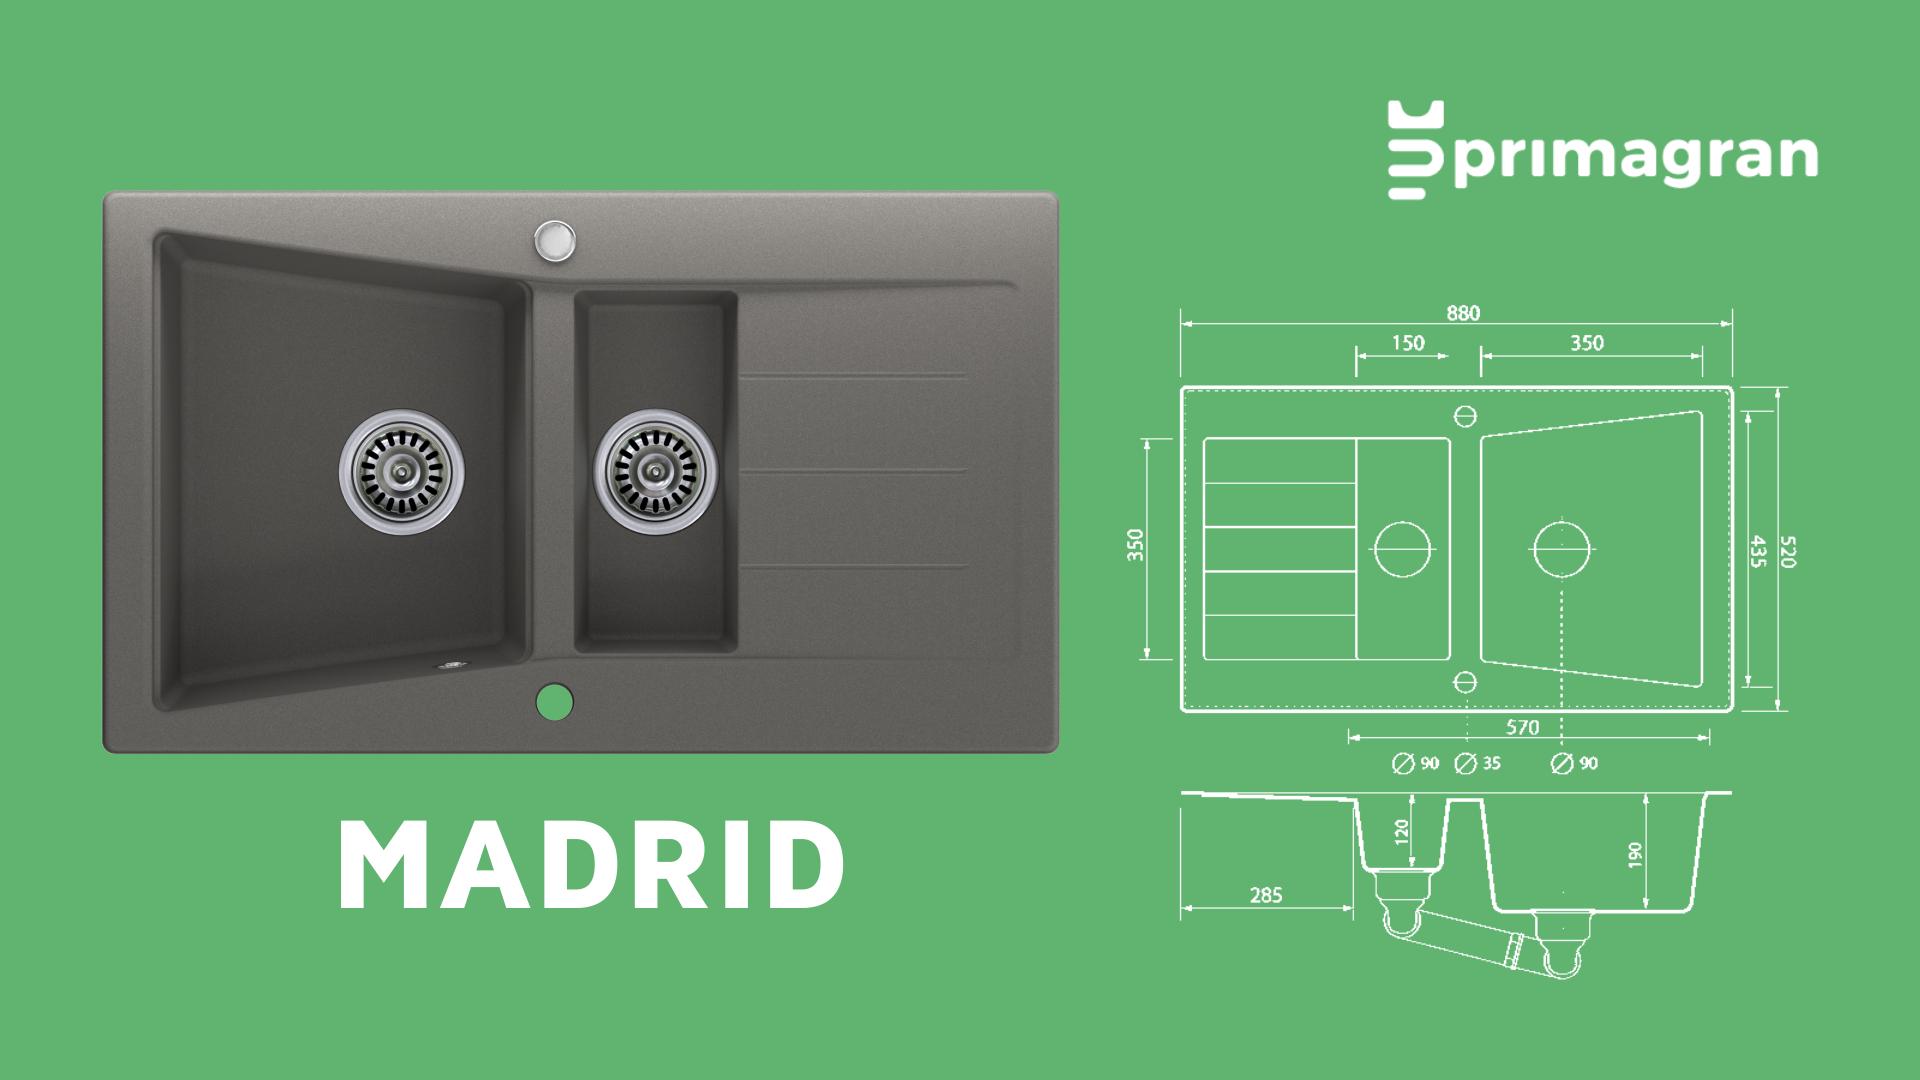 FR_primagran_Madrid.png